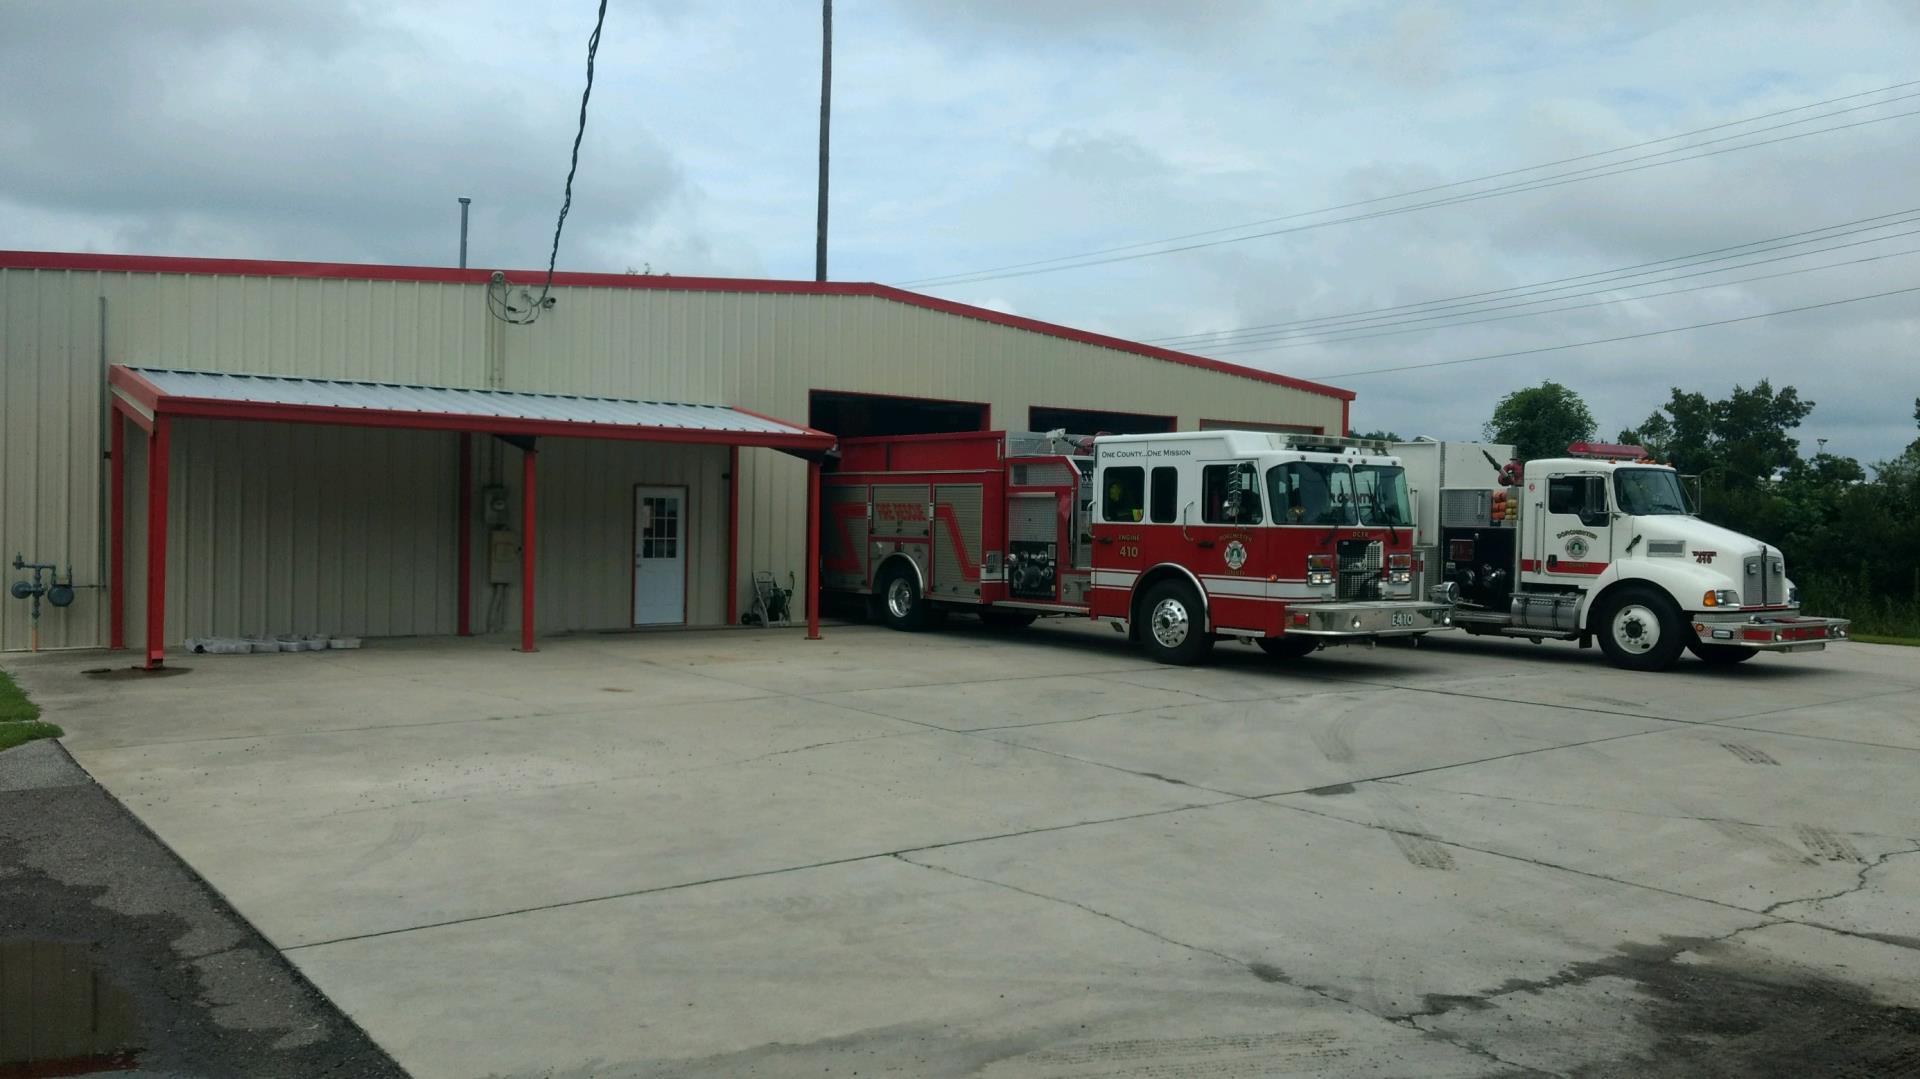 Dorchester County Fire Stations | Dorchester County, SC website